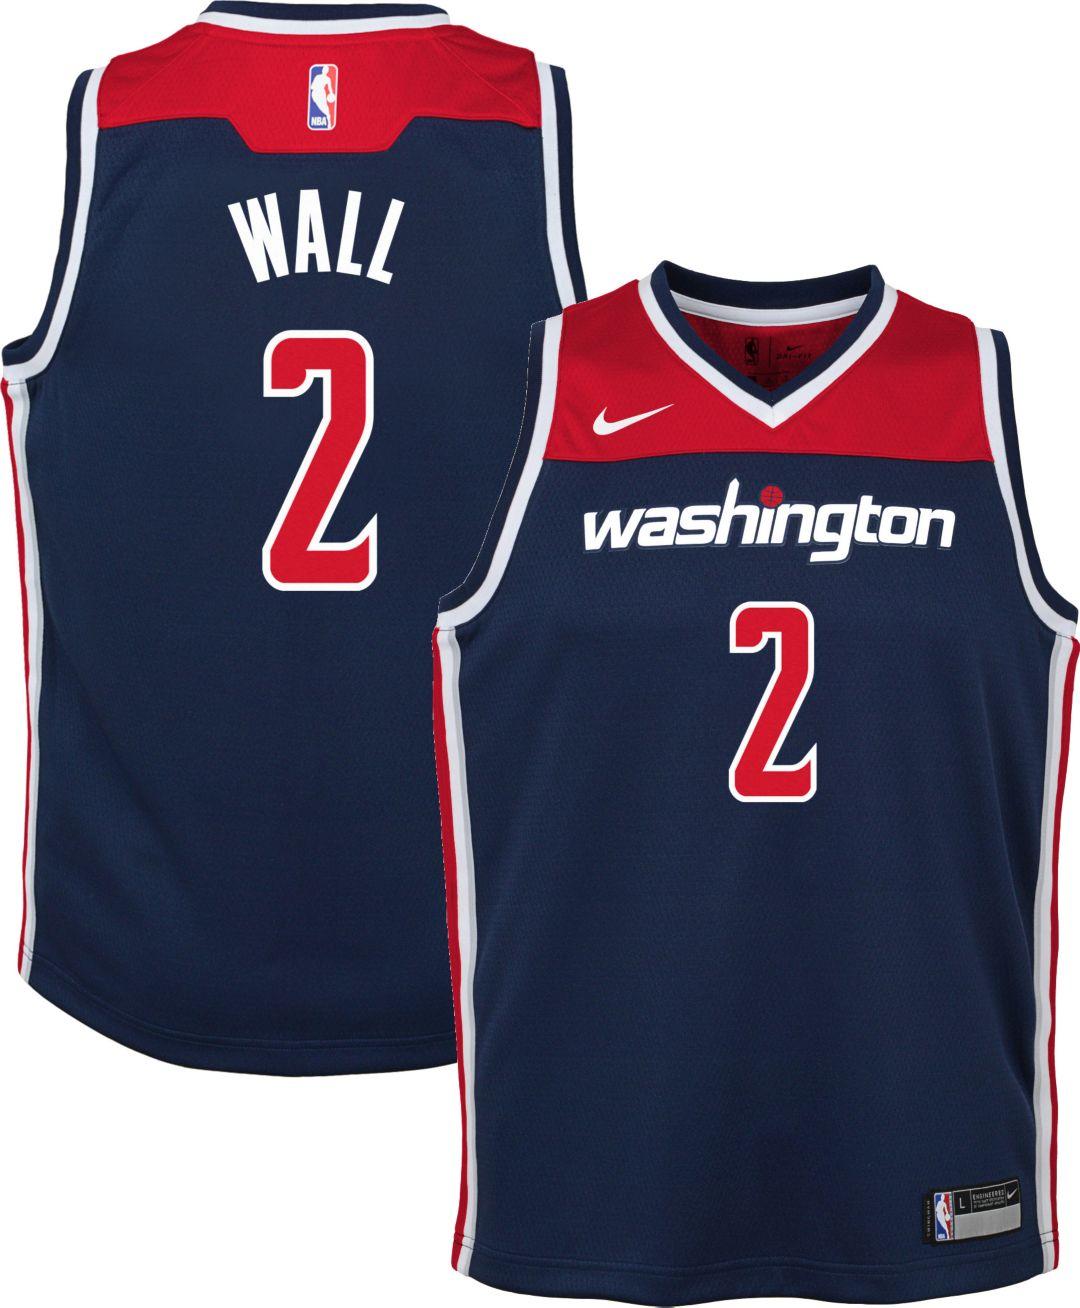 4db286cc Nike Youth Washington Wizards John Wall #2 Navy Dri-FIT Swingman ...